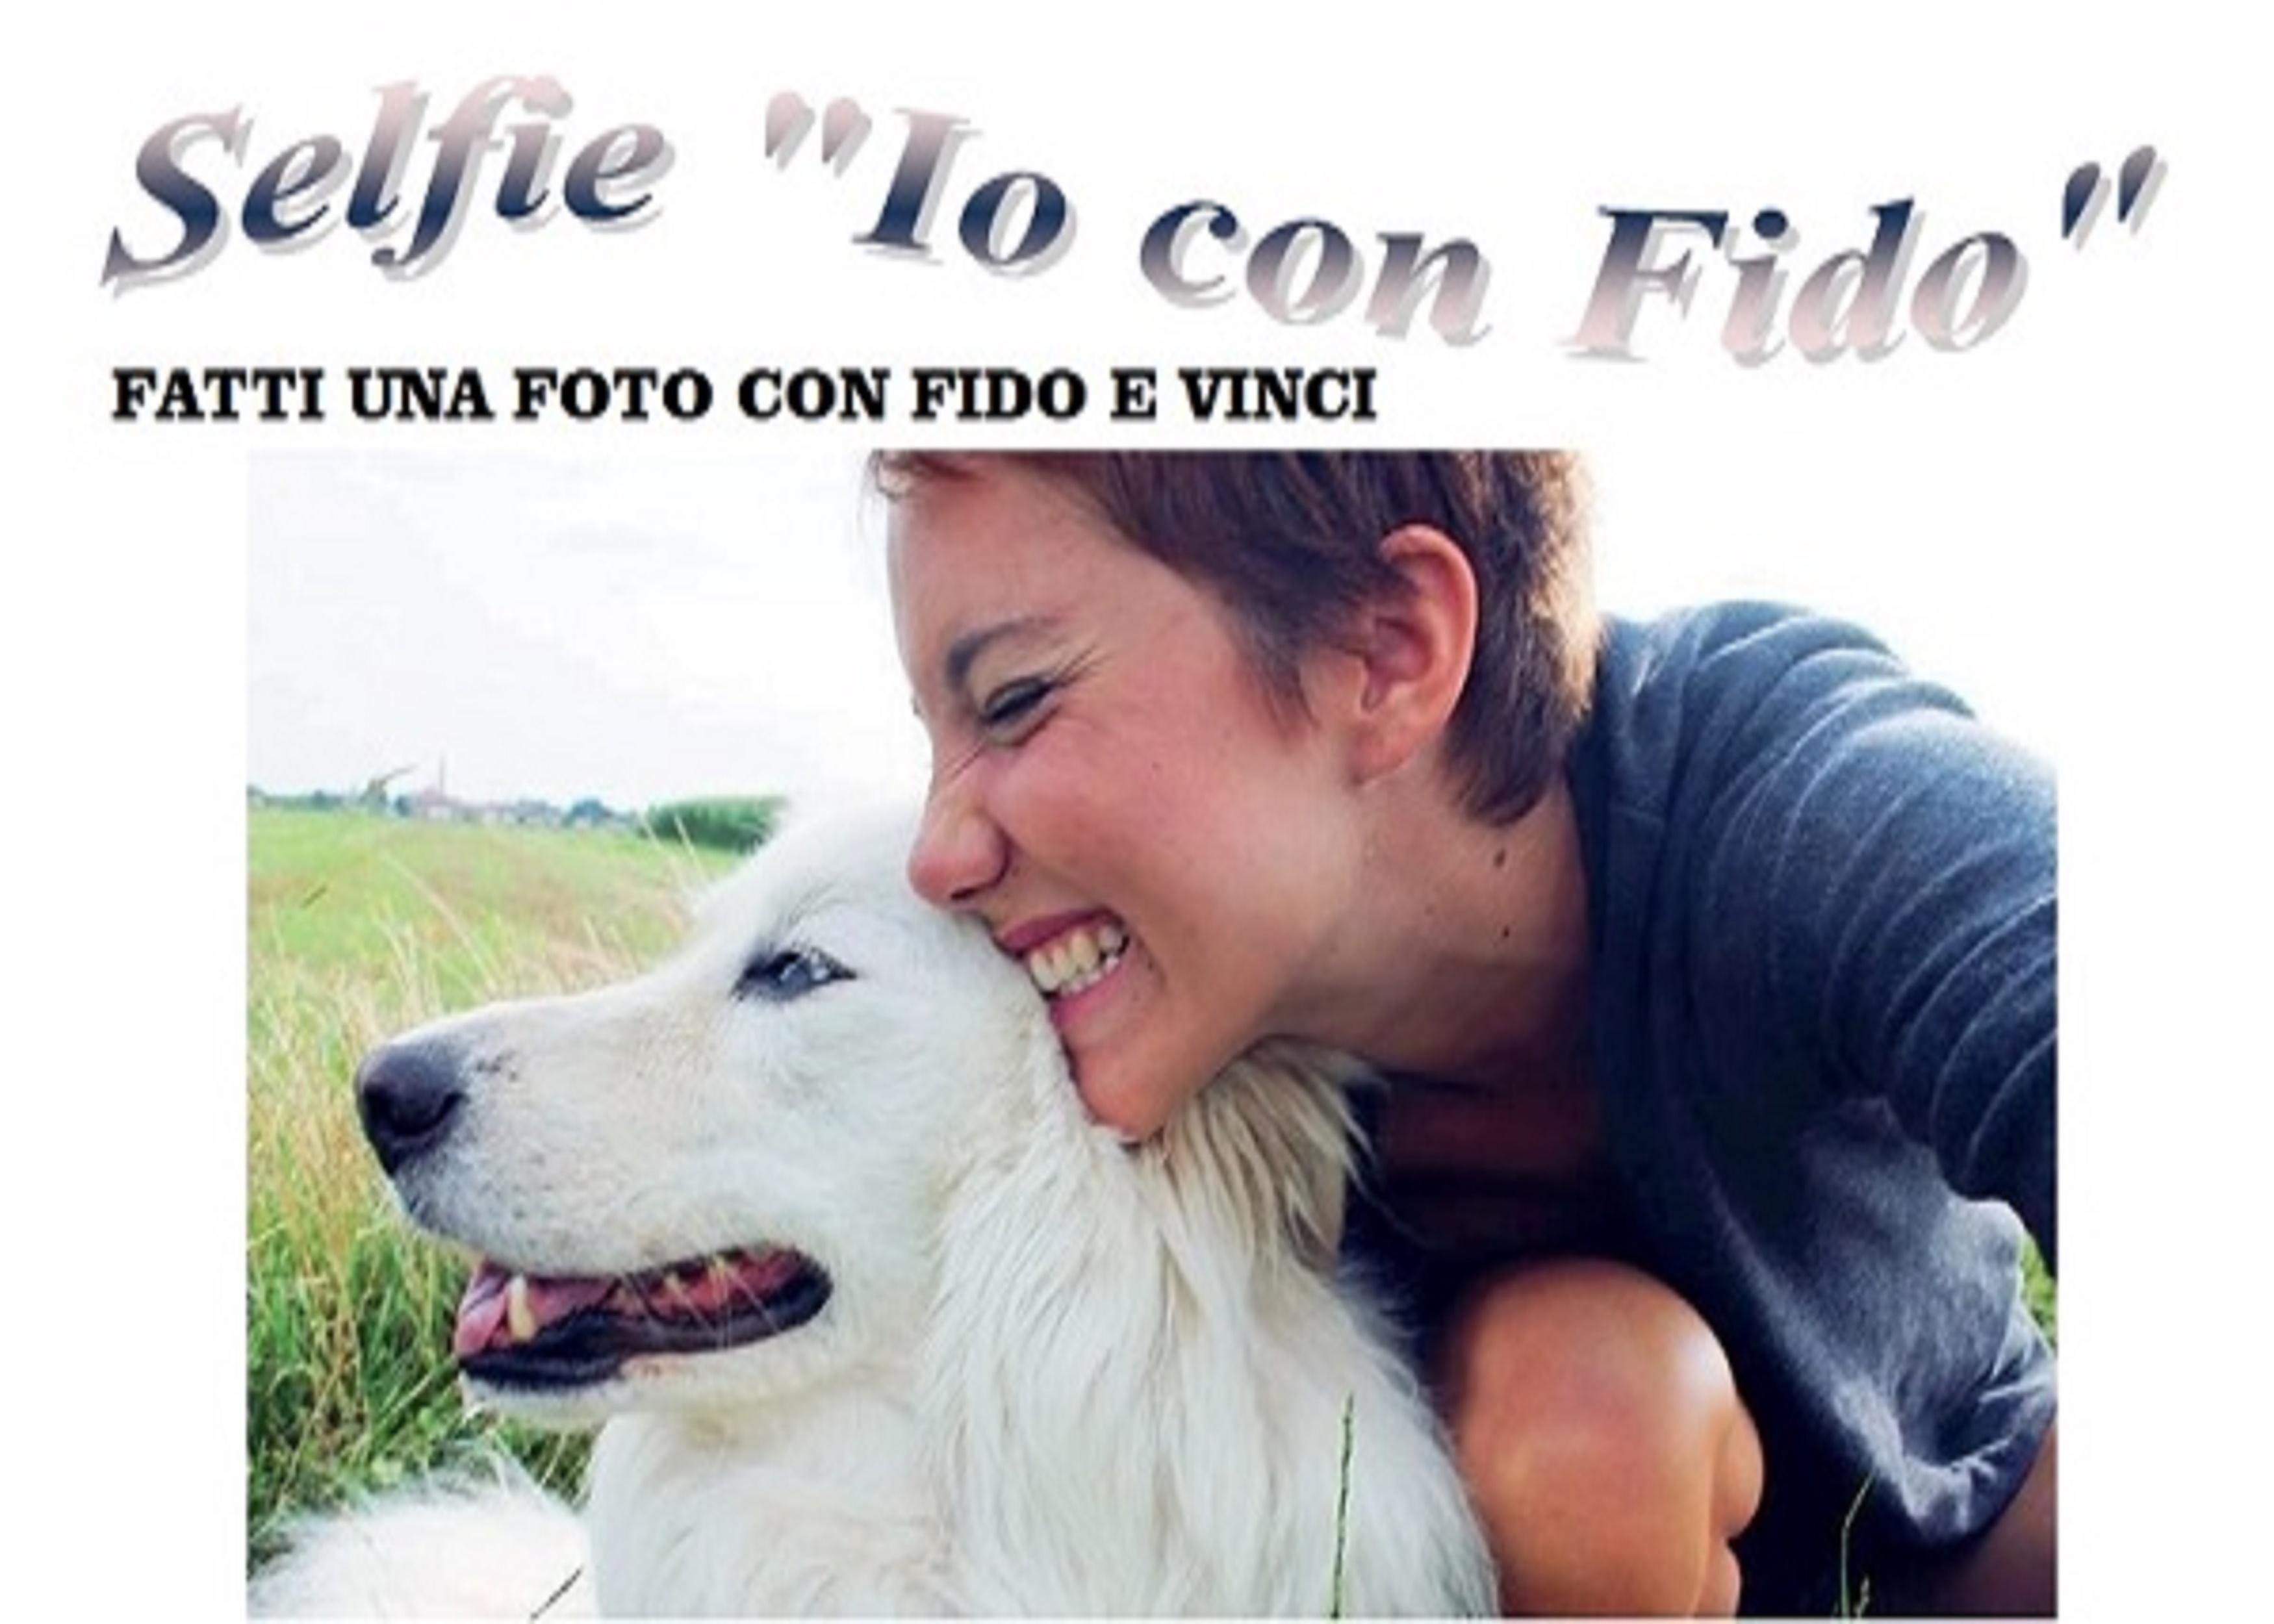 selfie-io-con-fido-grande